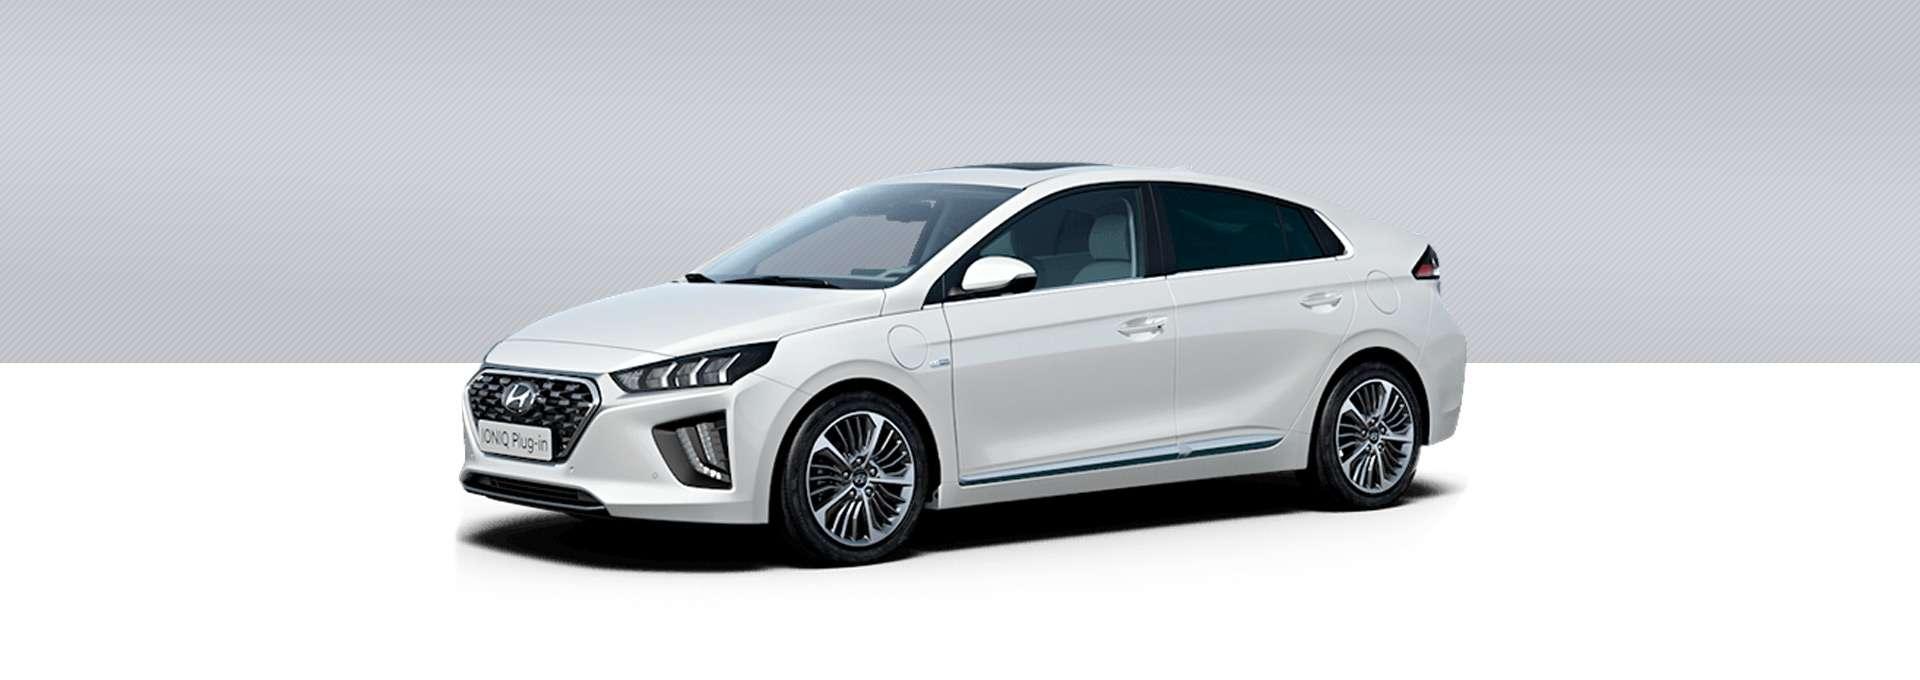 Hyundai Nuevo IONIQ Híbrido-Enchufable